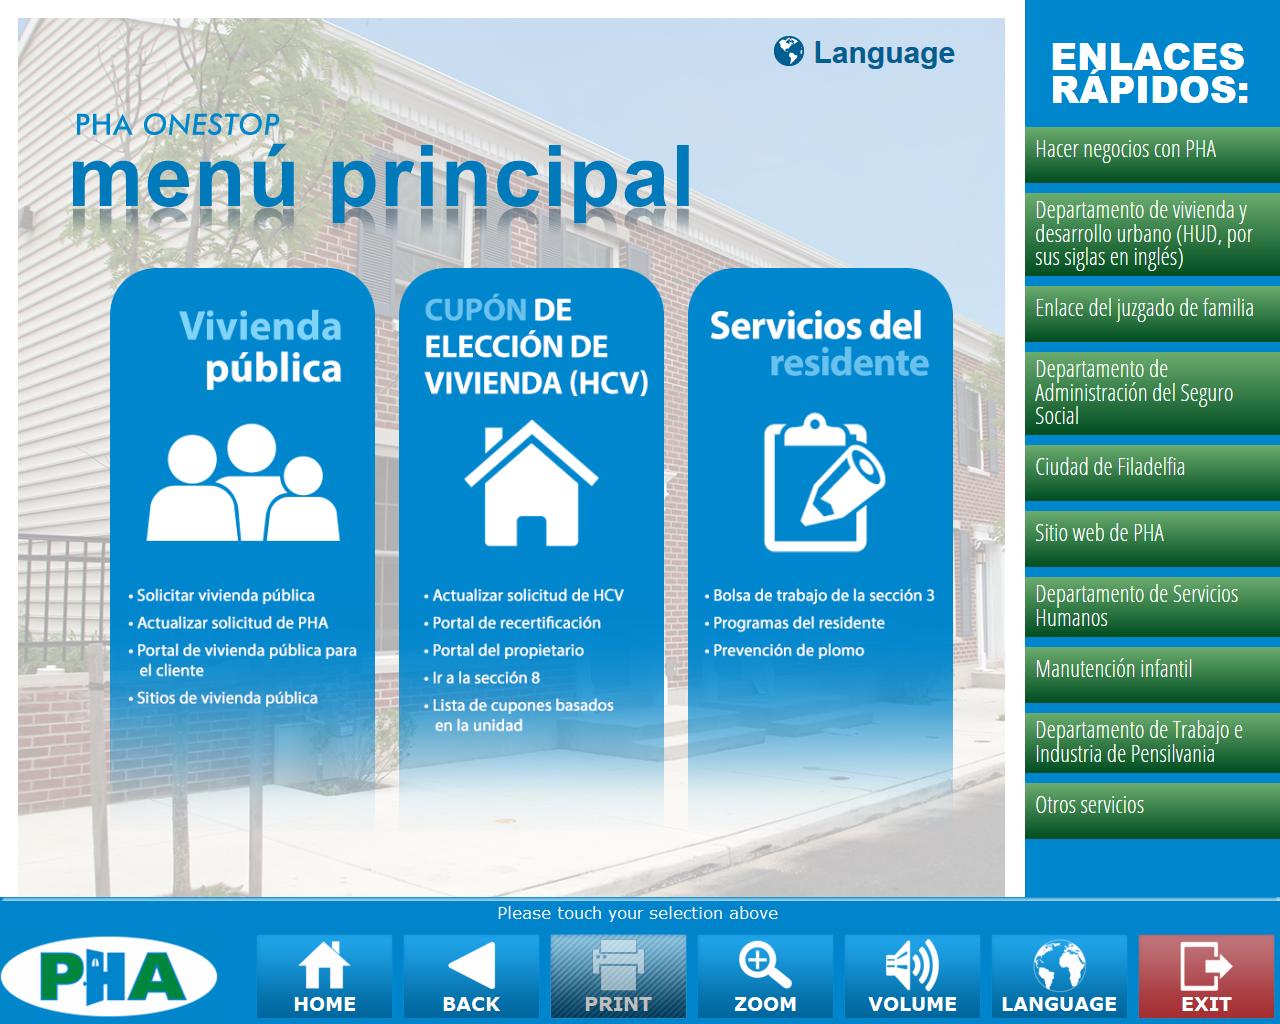 PHA OneStop Main Menu with Multiple Language Options: Philadelphia Housing Authority